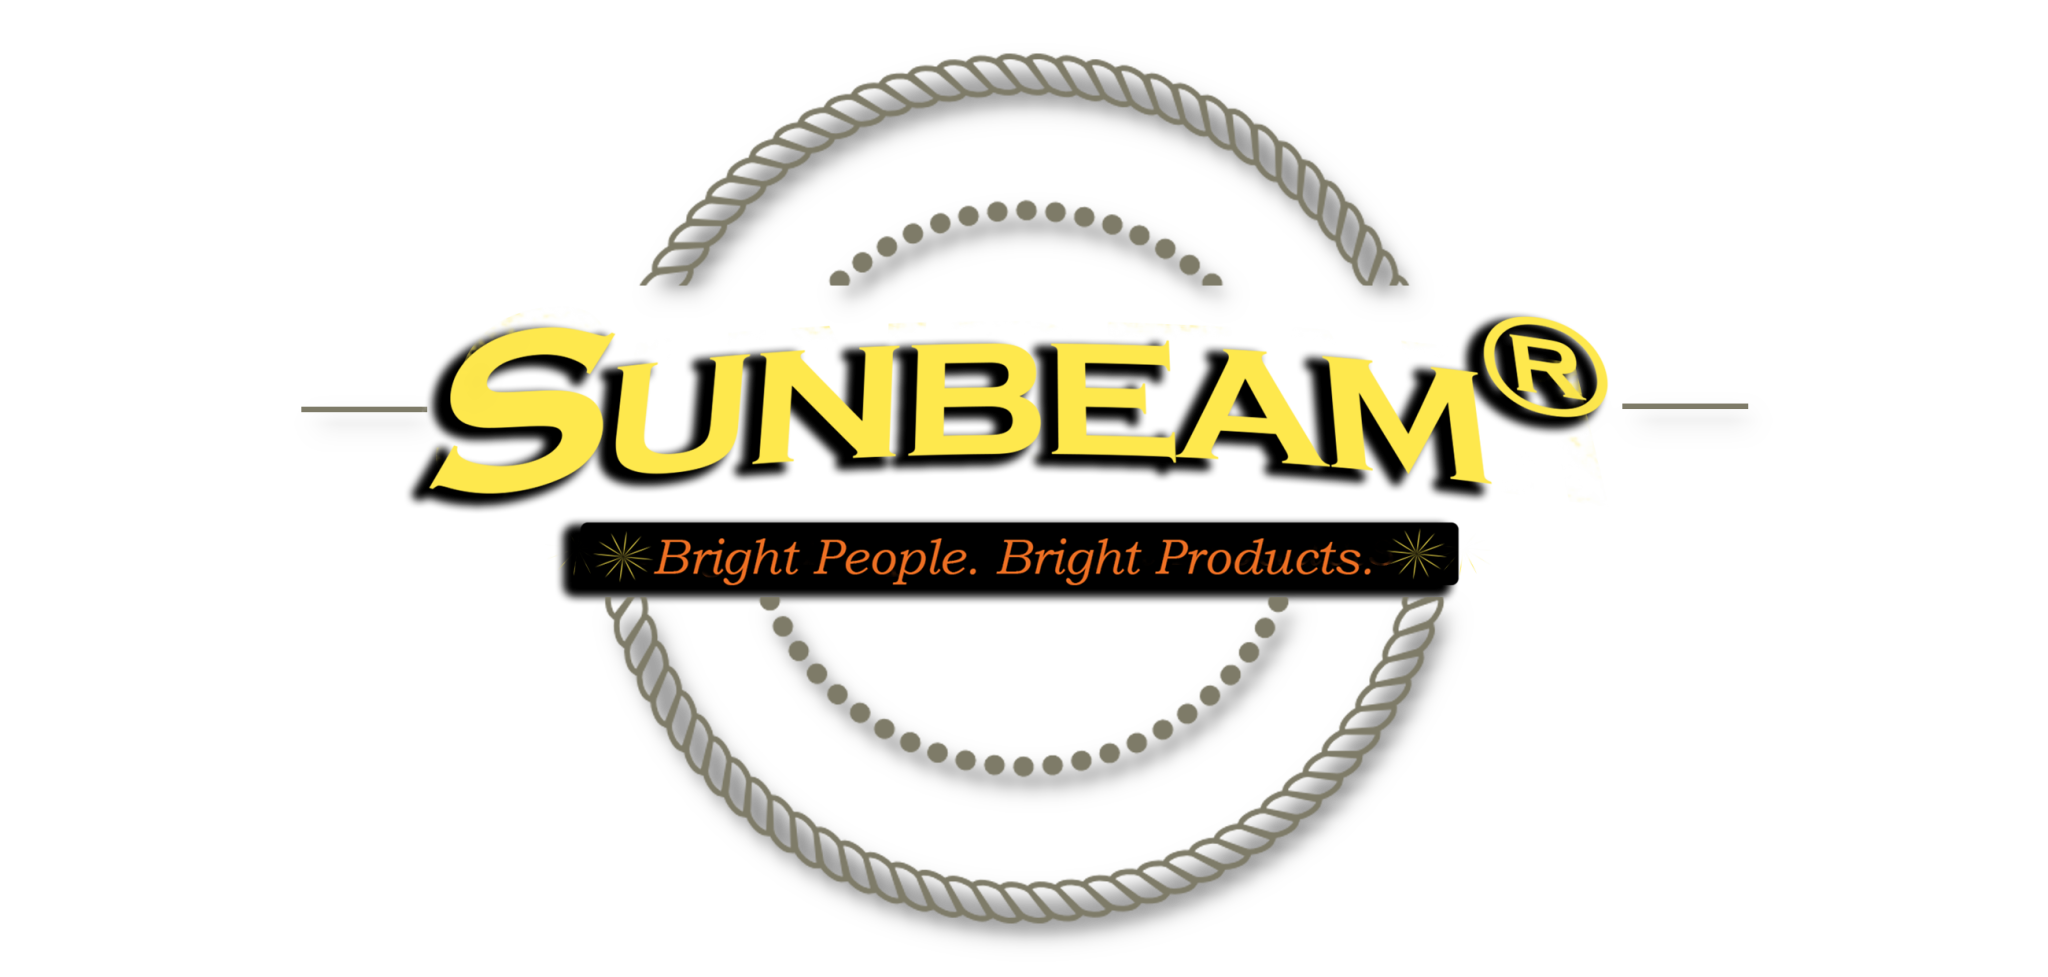 sunbeamlogo2